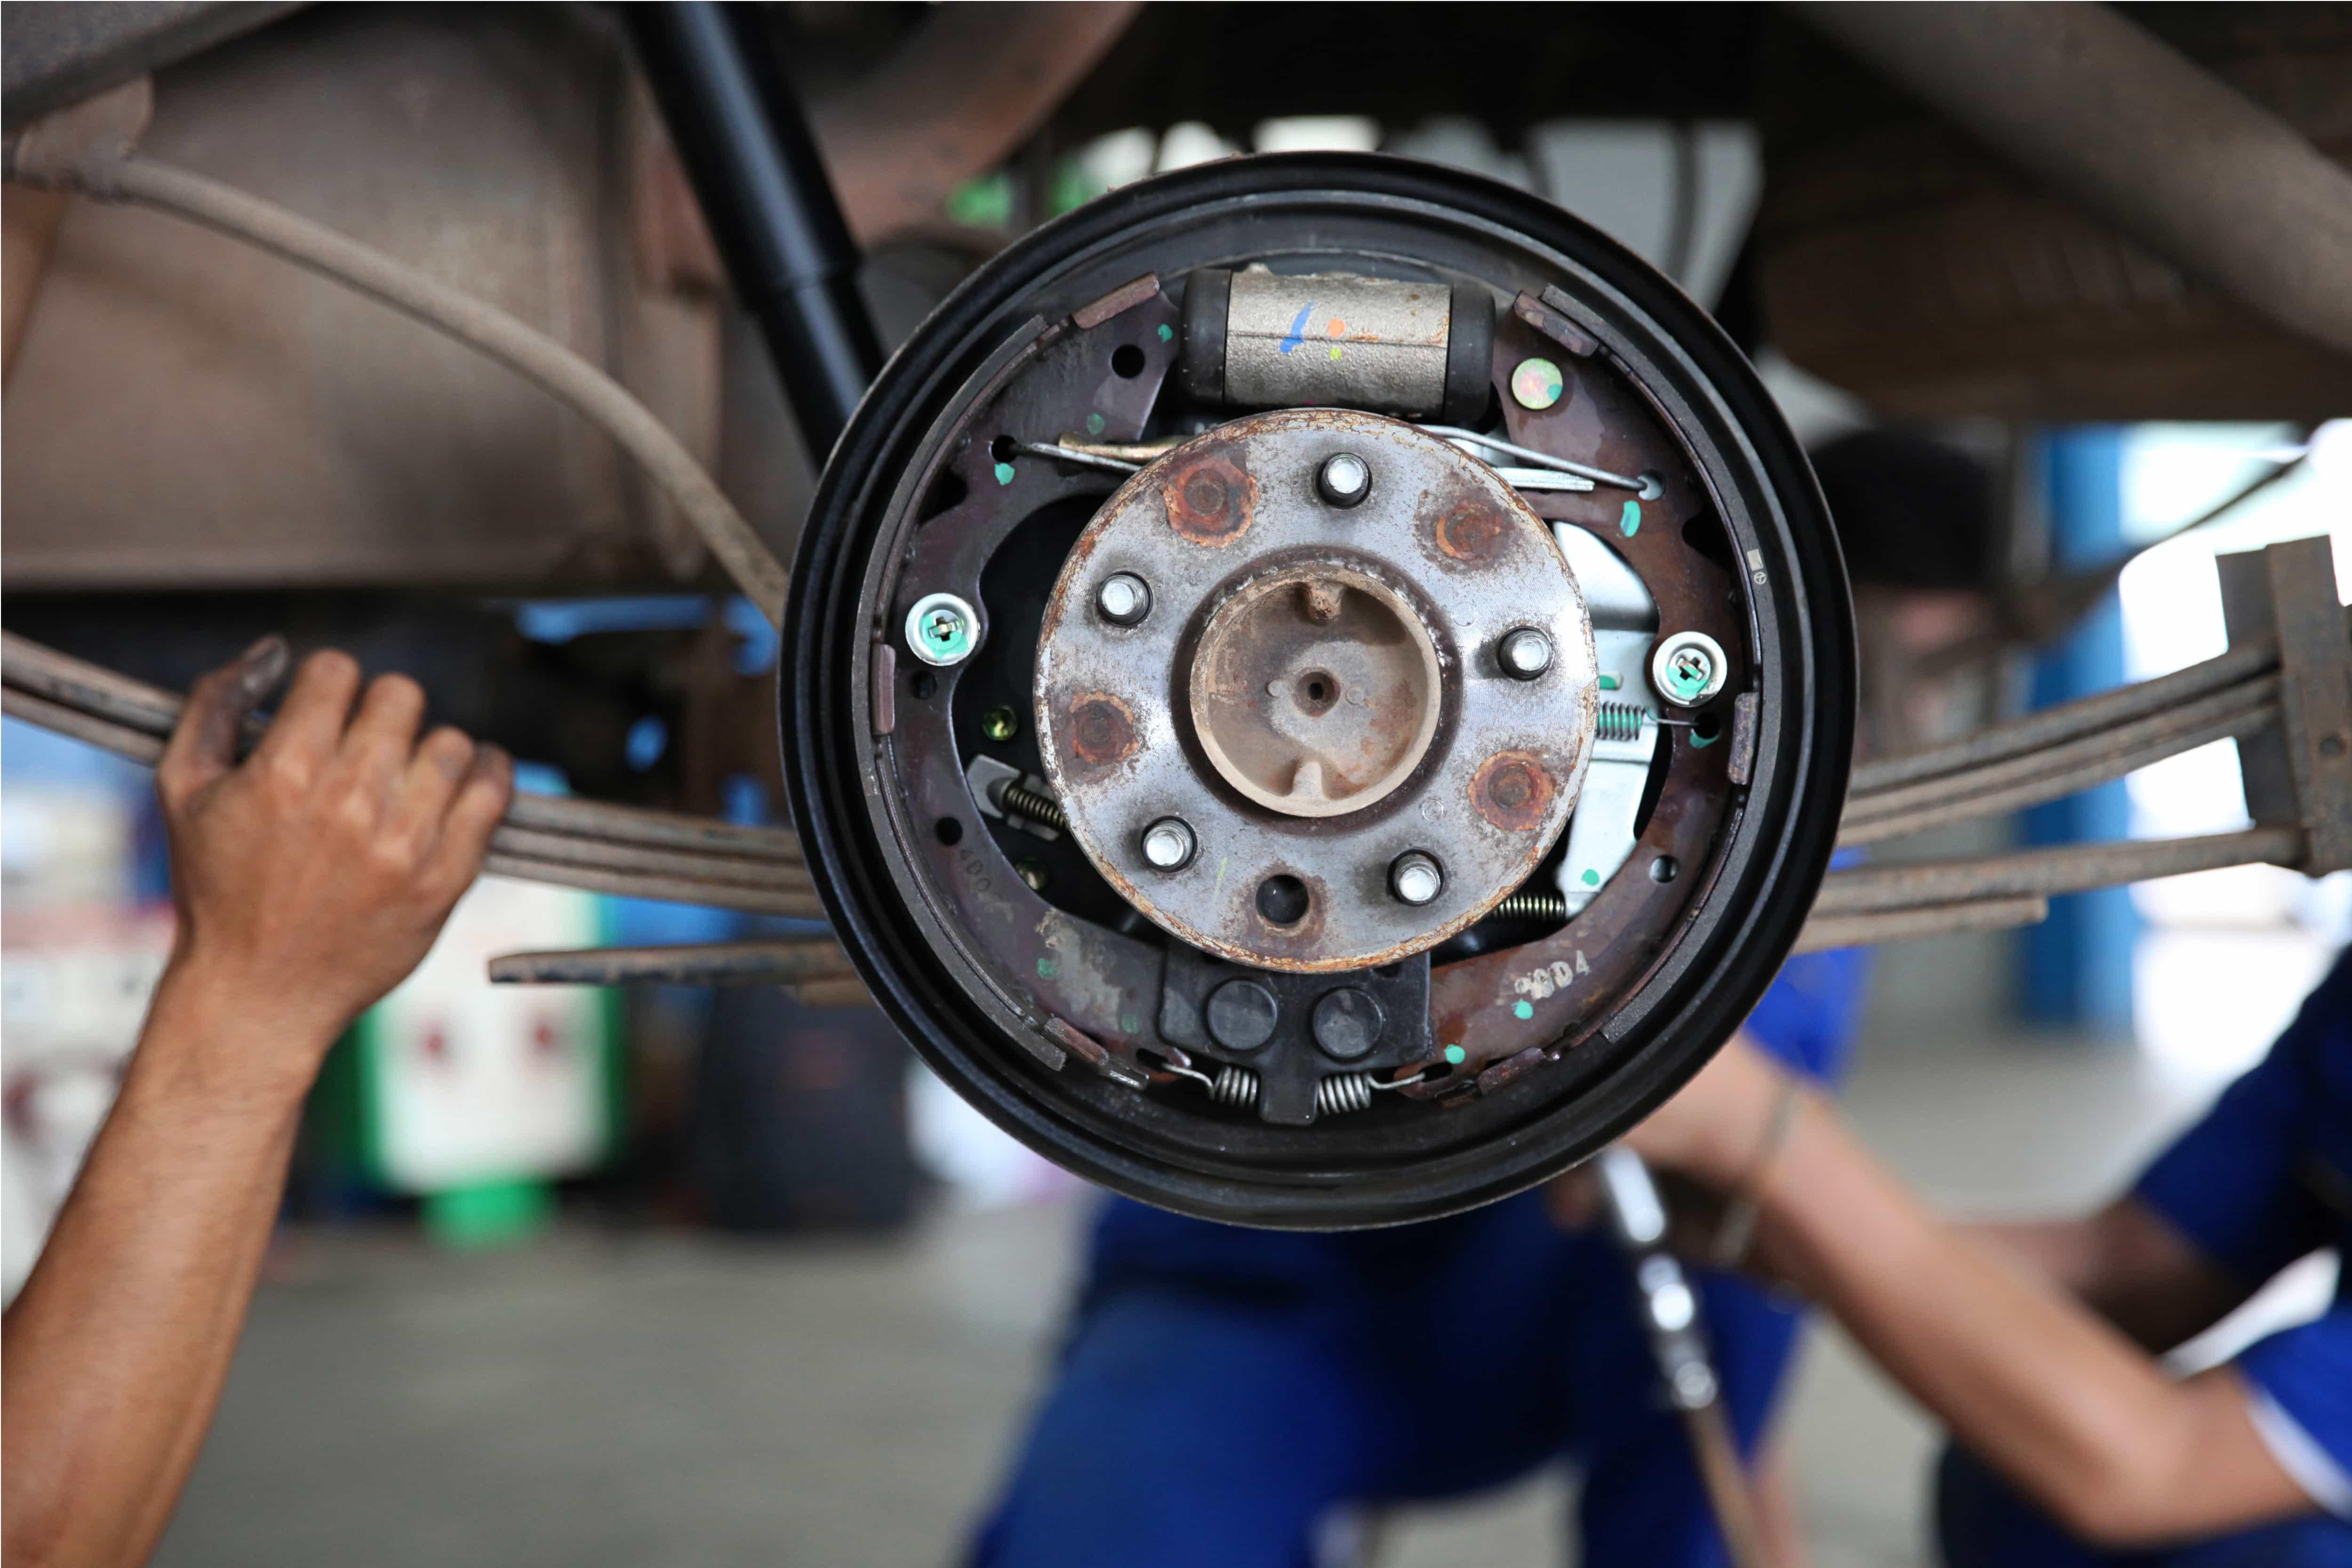 drum brake mechanism of a car wheel displaying cylinder